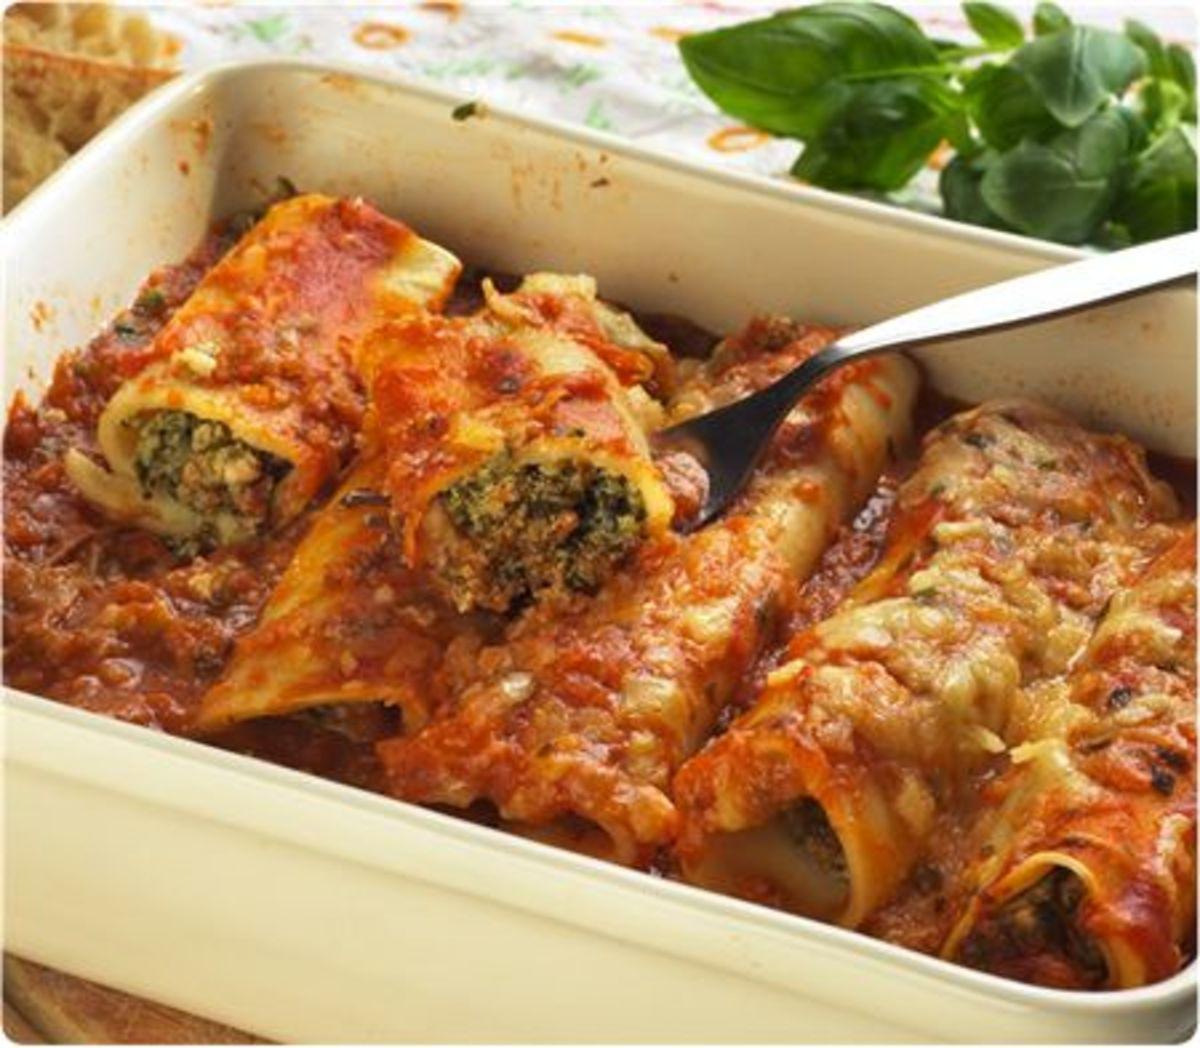 Cannelloni Au Gratin with Sardi's Sauce; revised recipe.